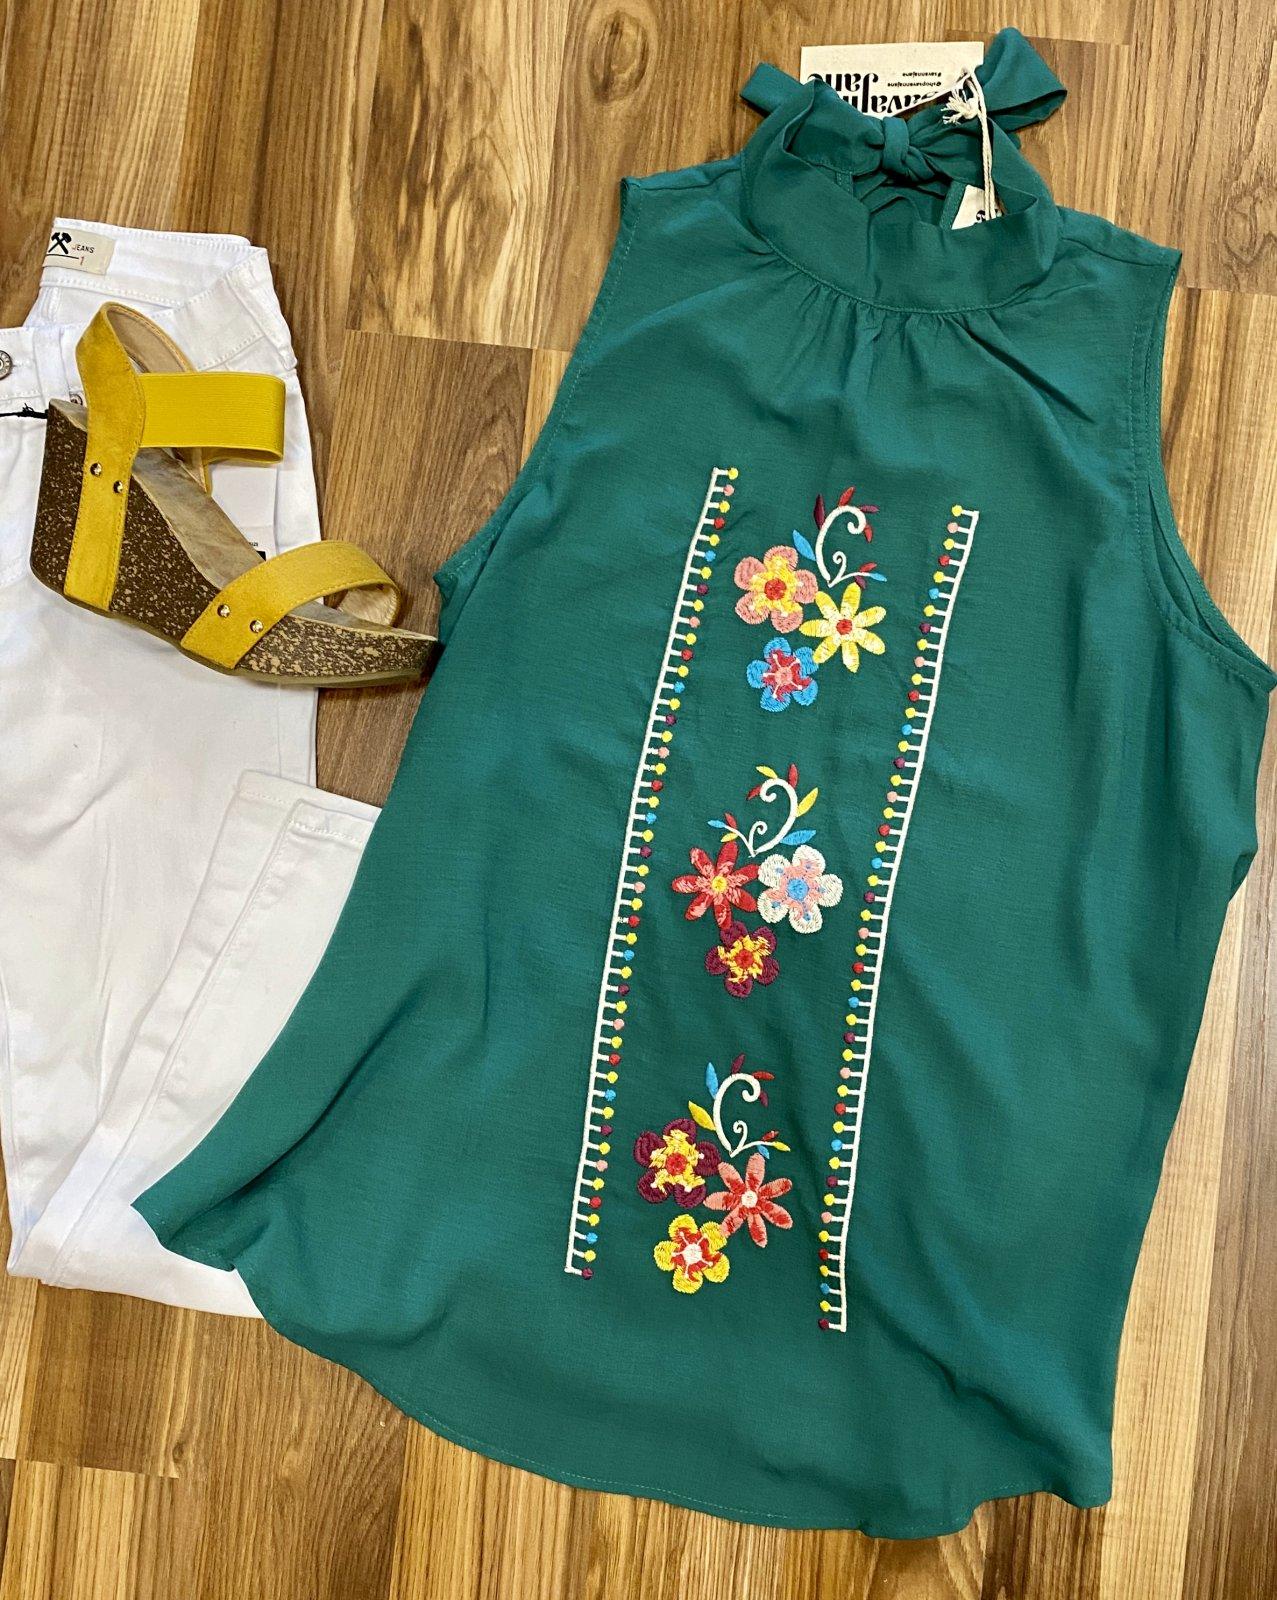 Savanna Jane embroidered sleevless